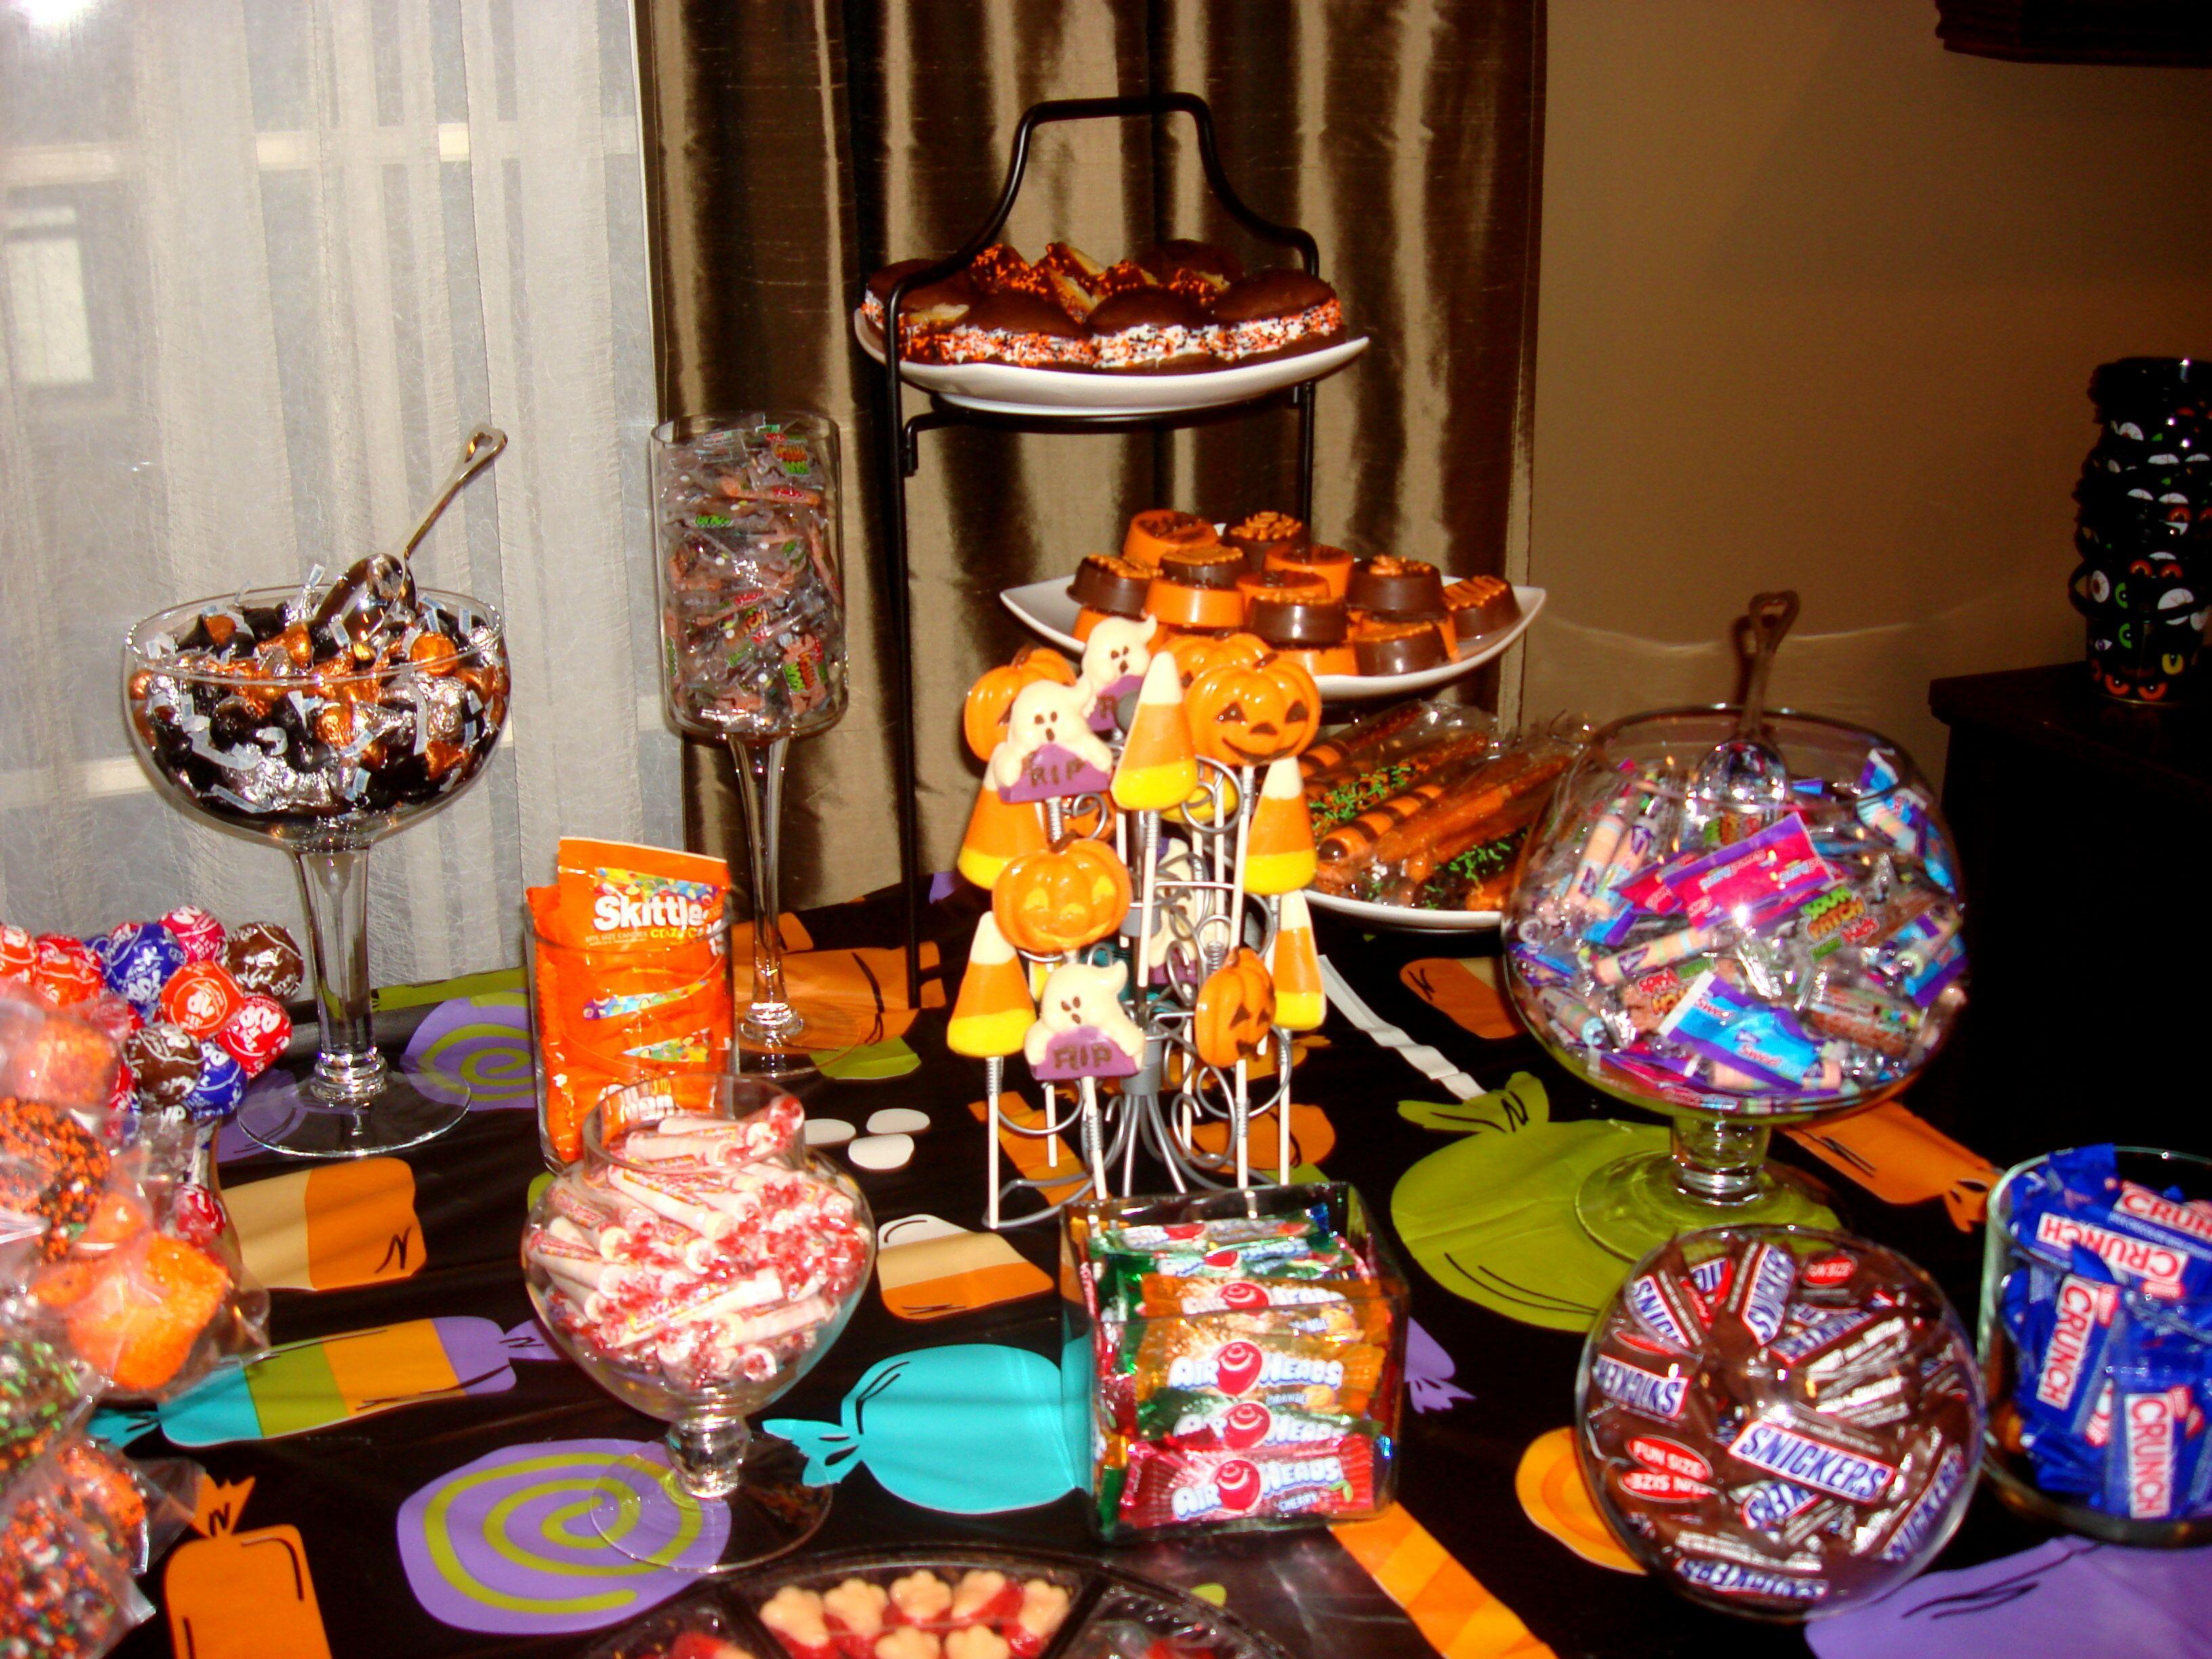 Halloween Candy Table Ideas.Halloween Candy Table Halloween Candy Table Halloween Candy Candy Table